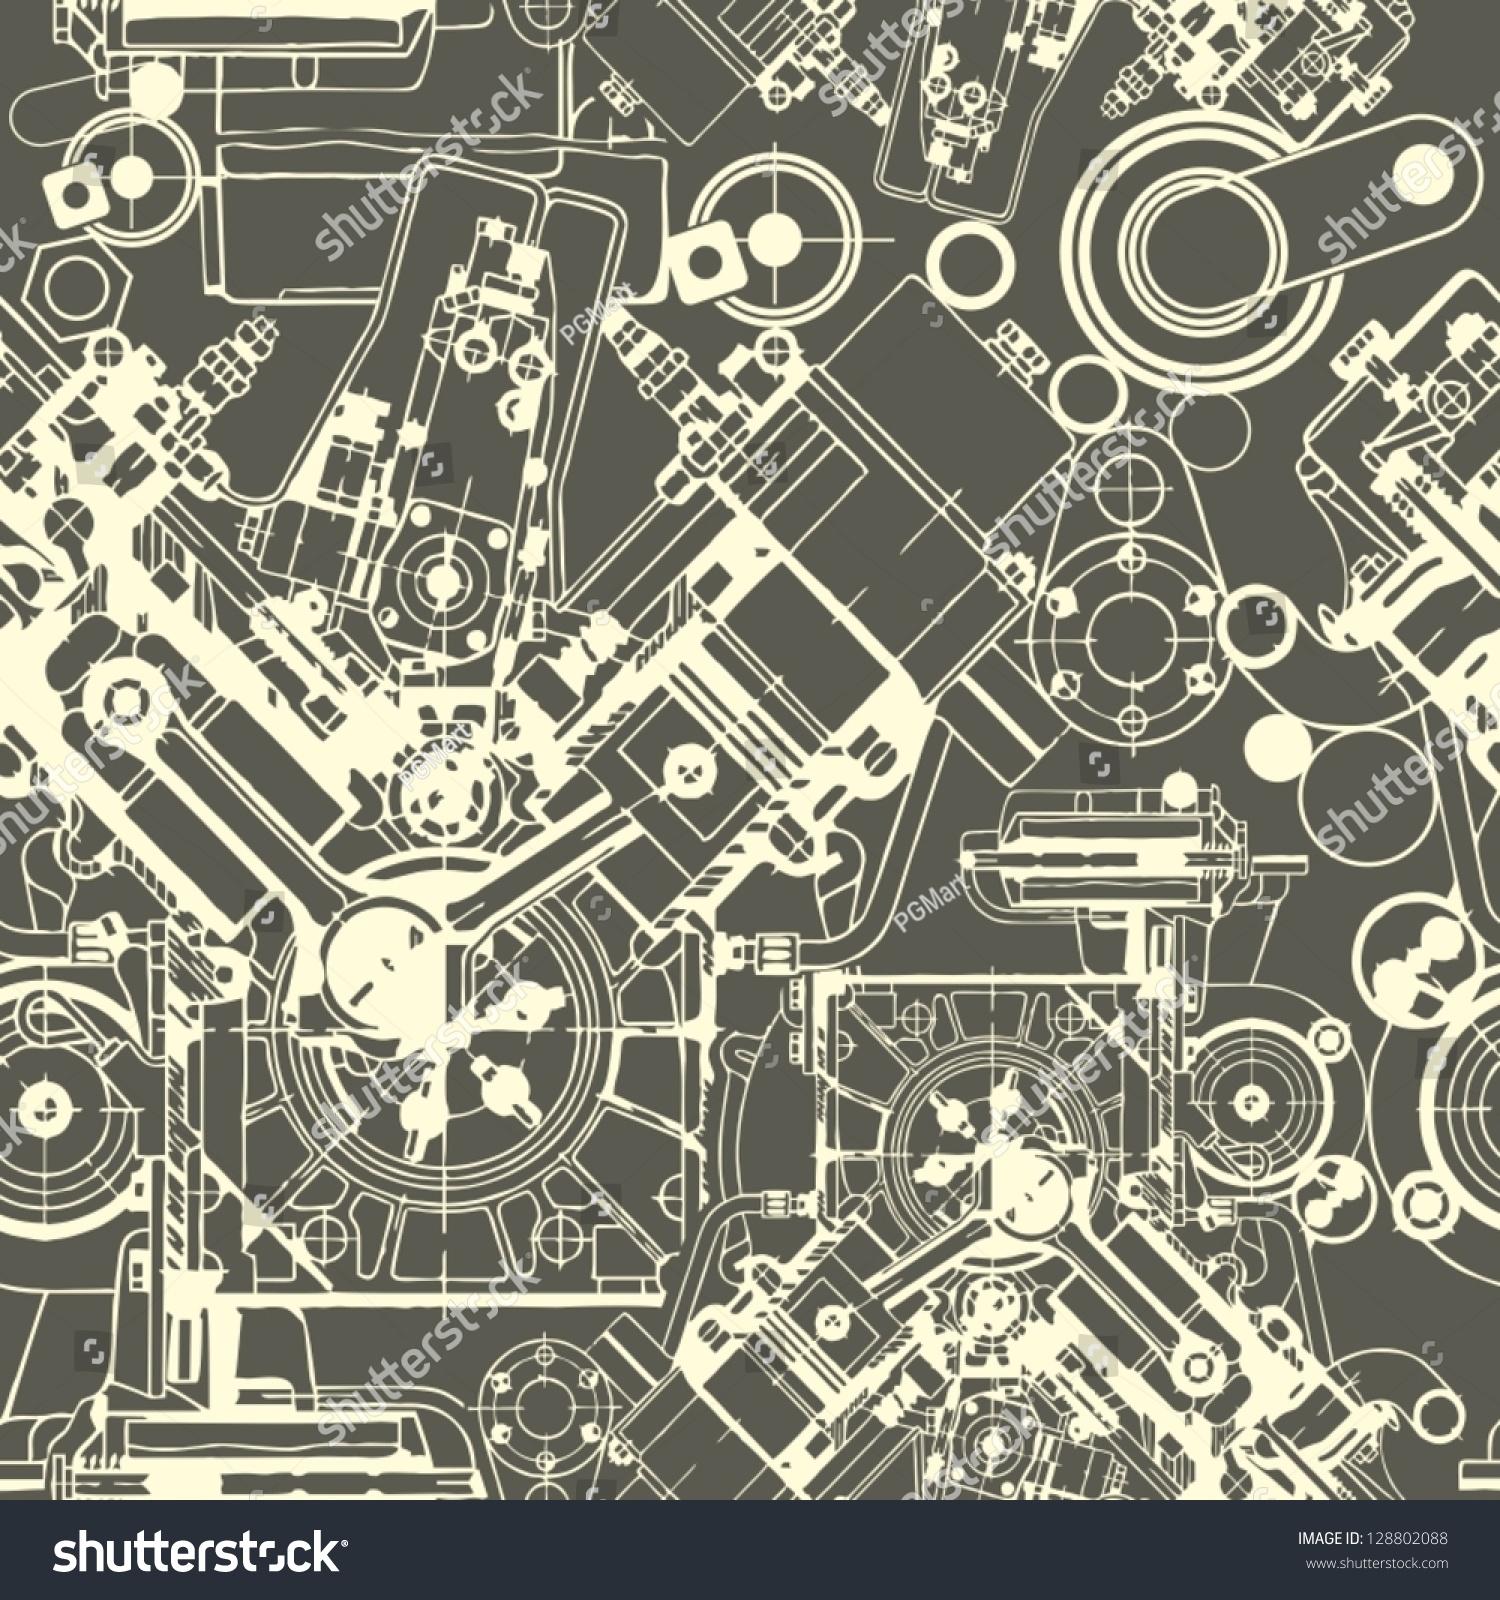 Drawing Engine Seamless Pattern  Background  Seamless Pattern Can Be Used For Wallpaper  Pattern